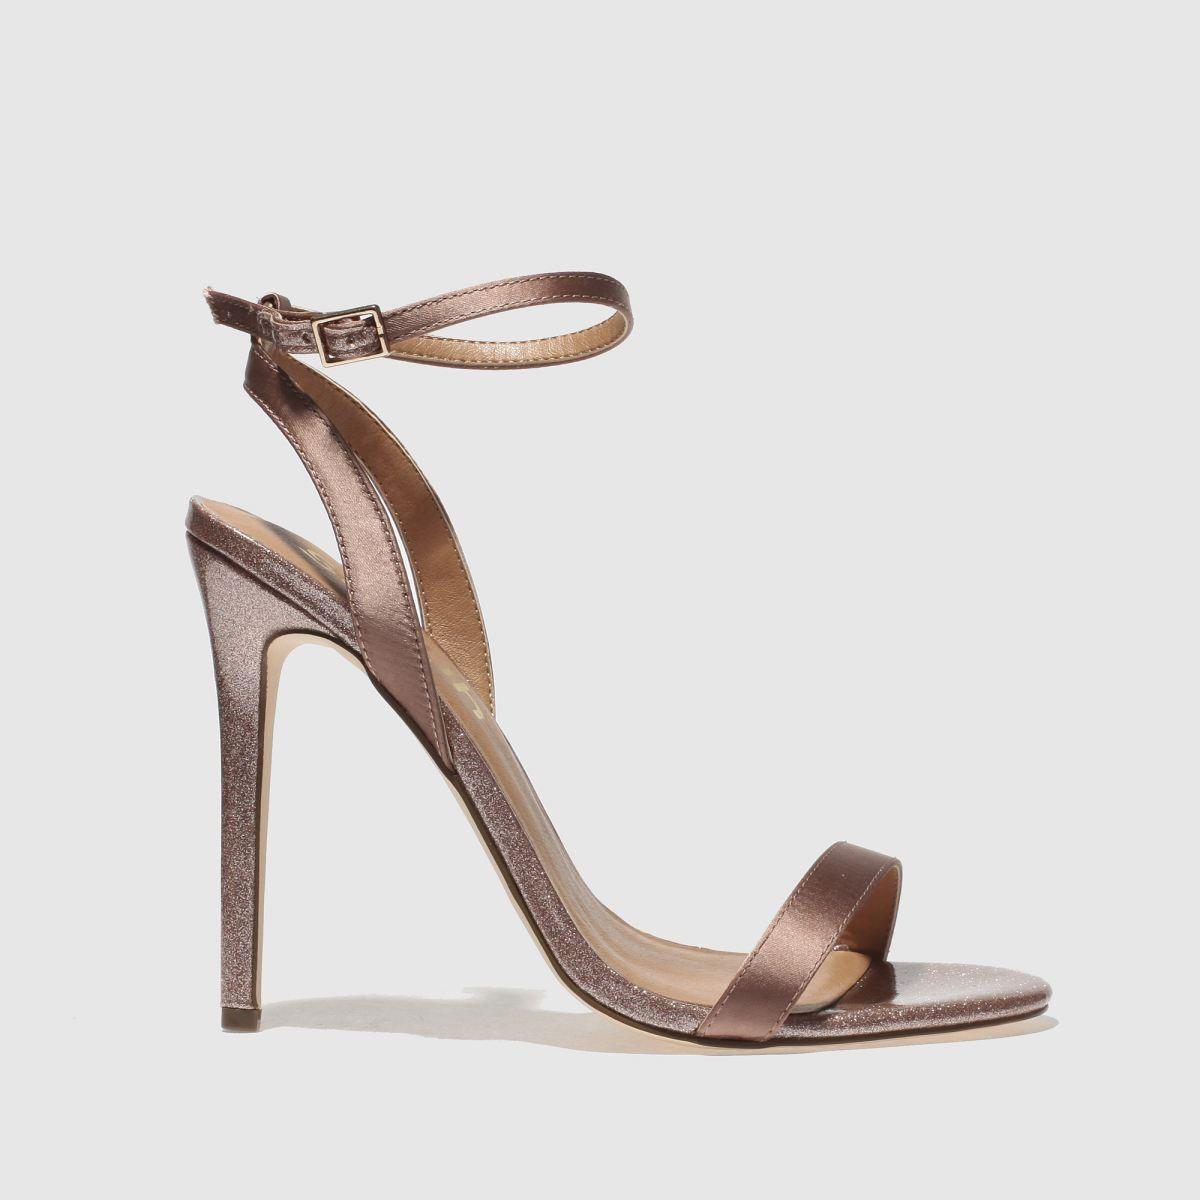 Schuh Pink Majorca High Heels